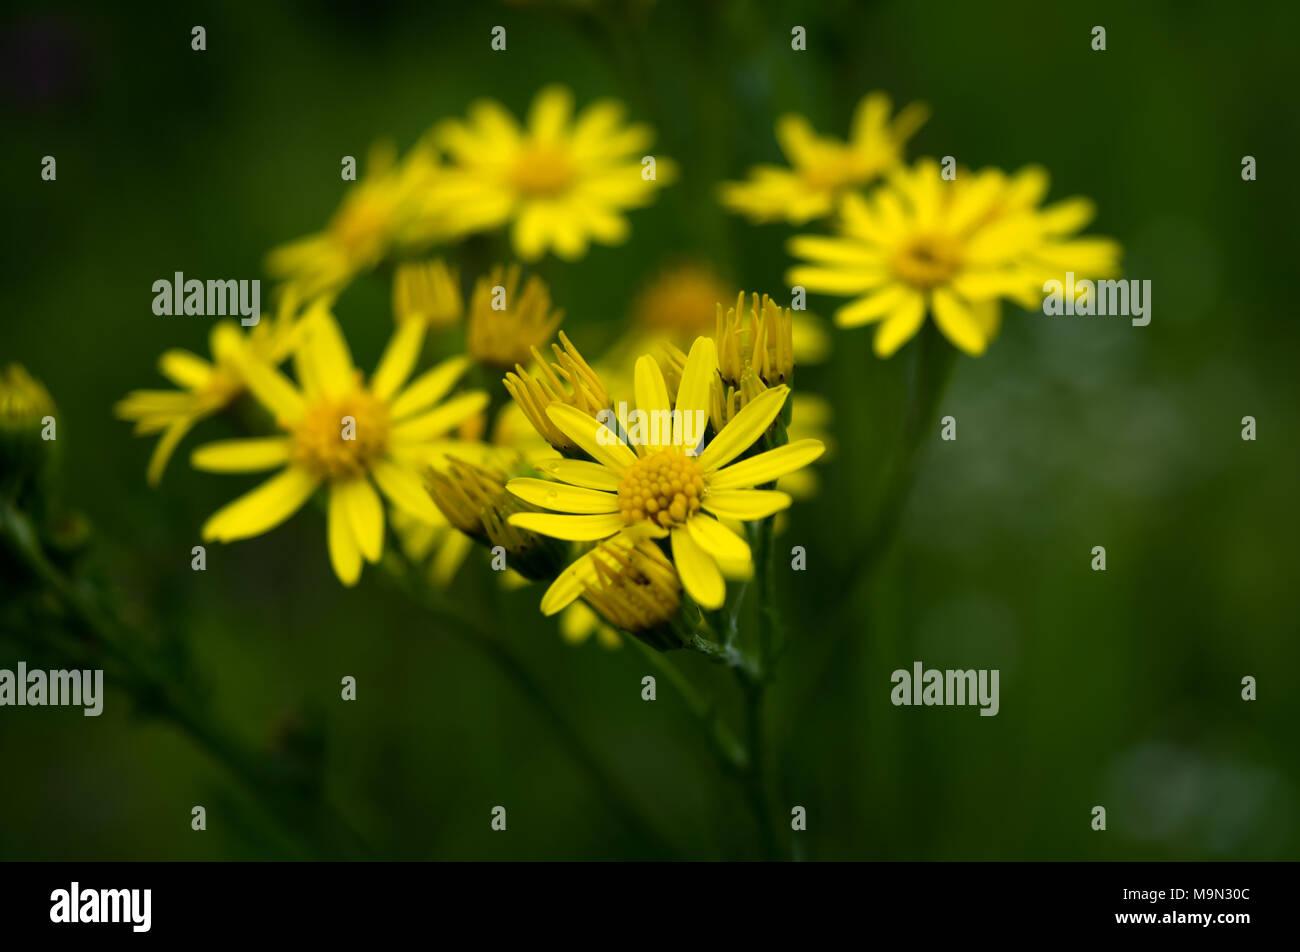 Beautiful Yellow Daisy Flowers On Dark Background Stock Photo